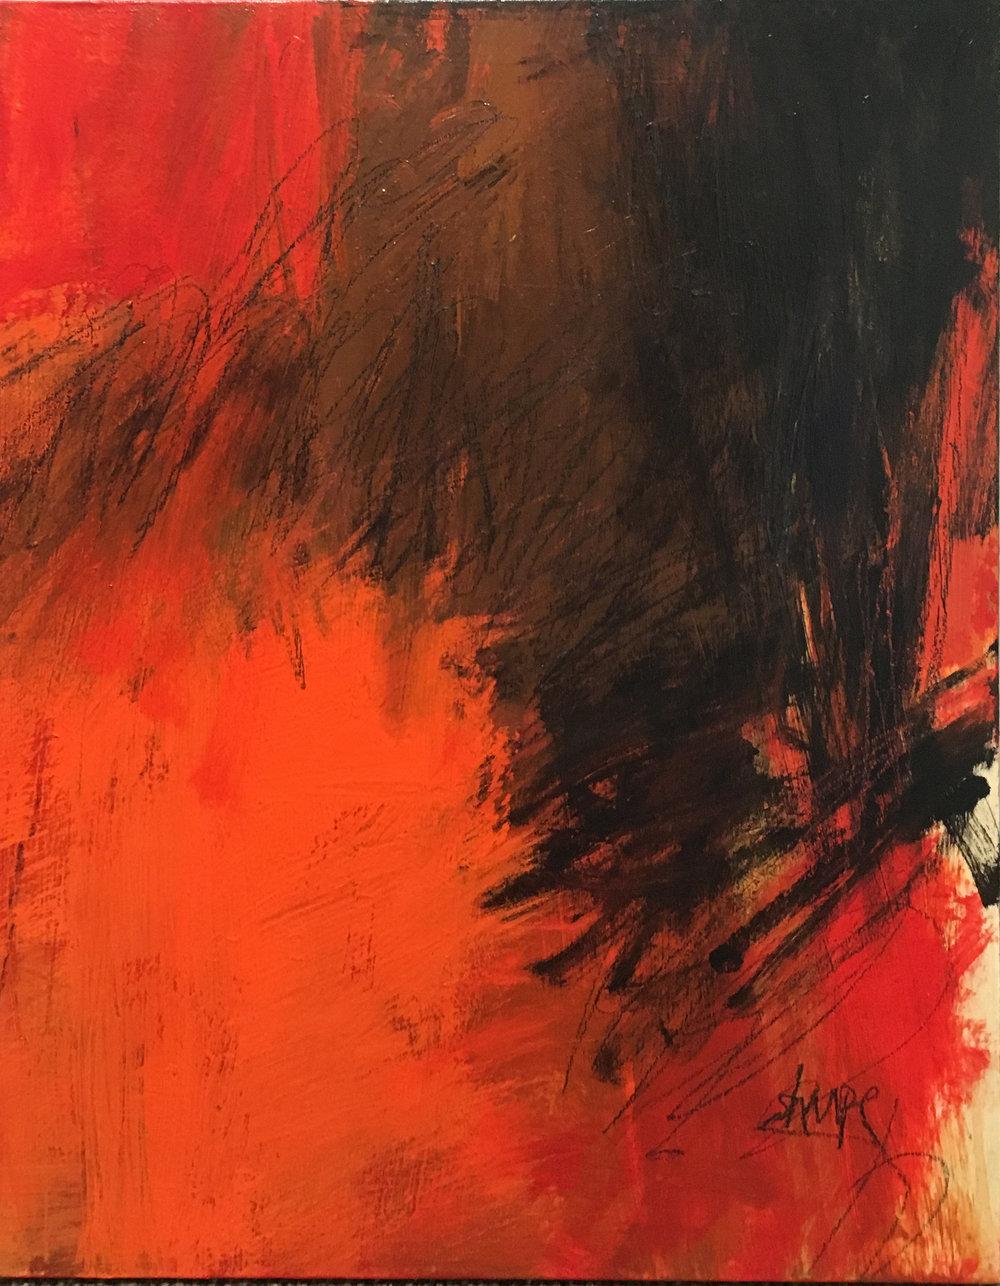 Fever Pitch by David Sharpe